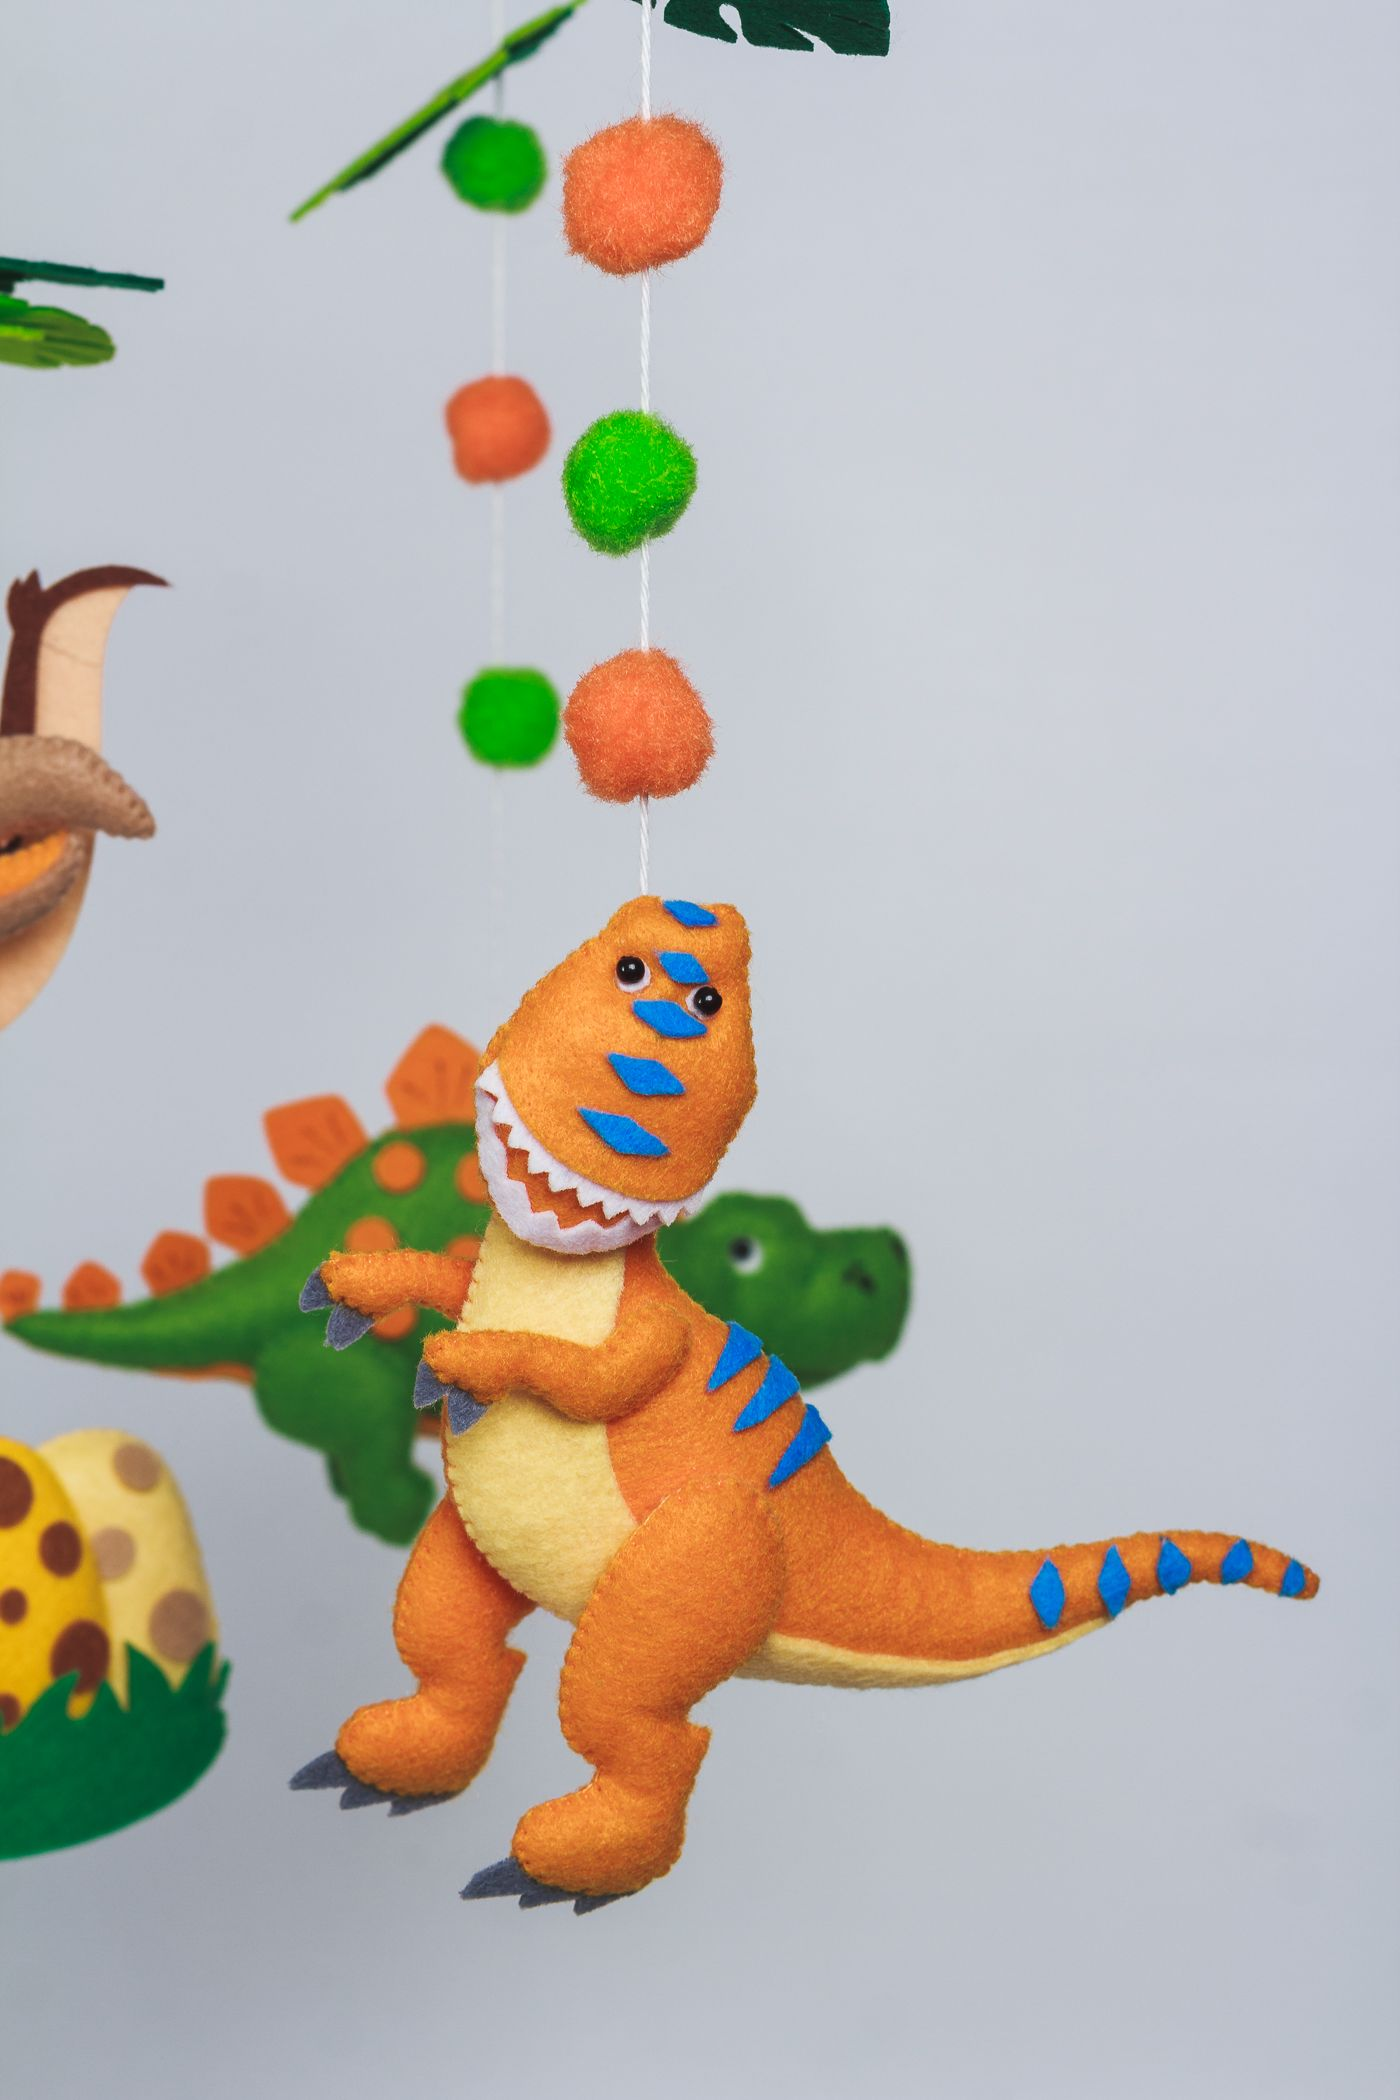 Dinosaur mobile for nursery with 5 different felt dinos